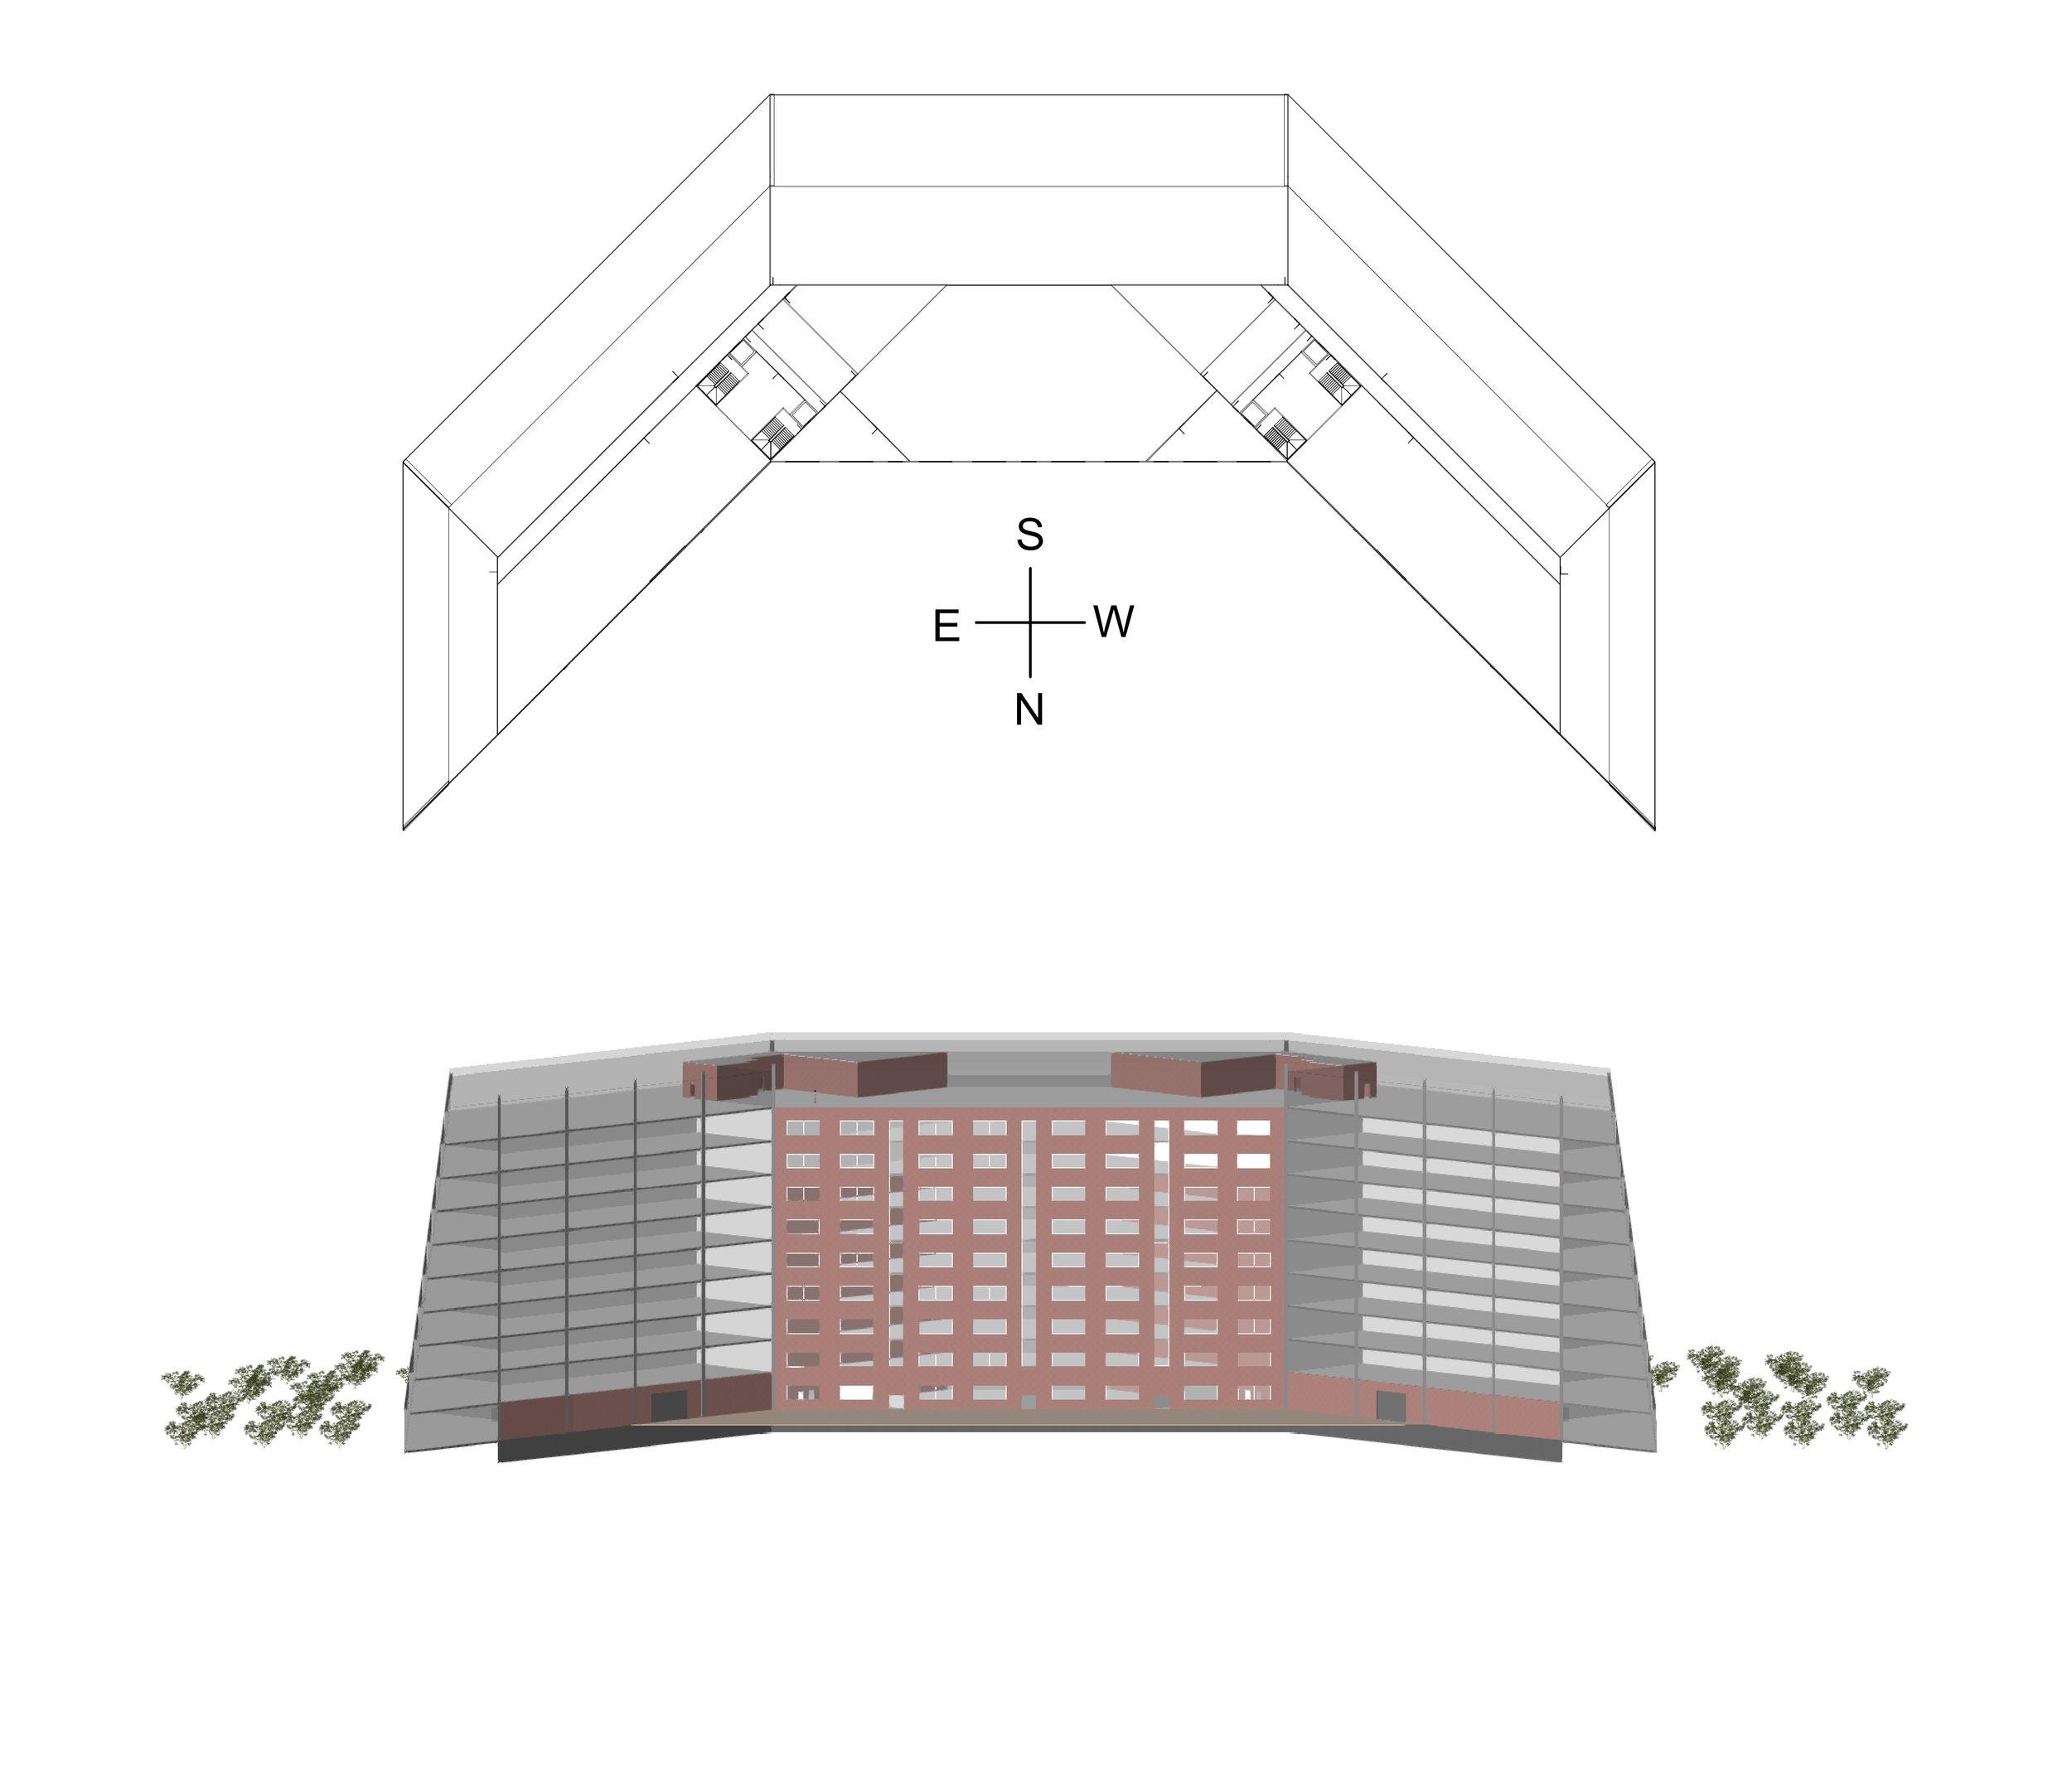 fordhamopolis-plan.jpg